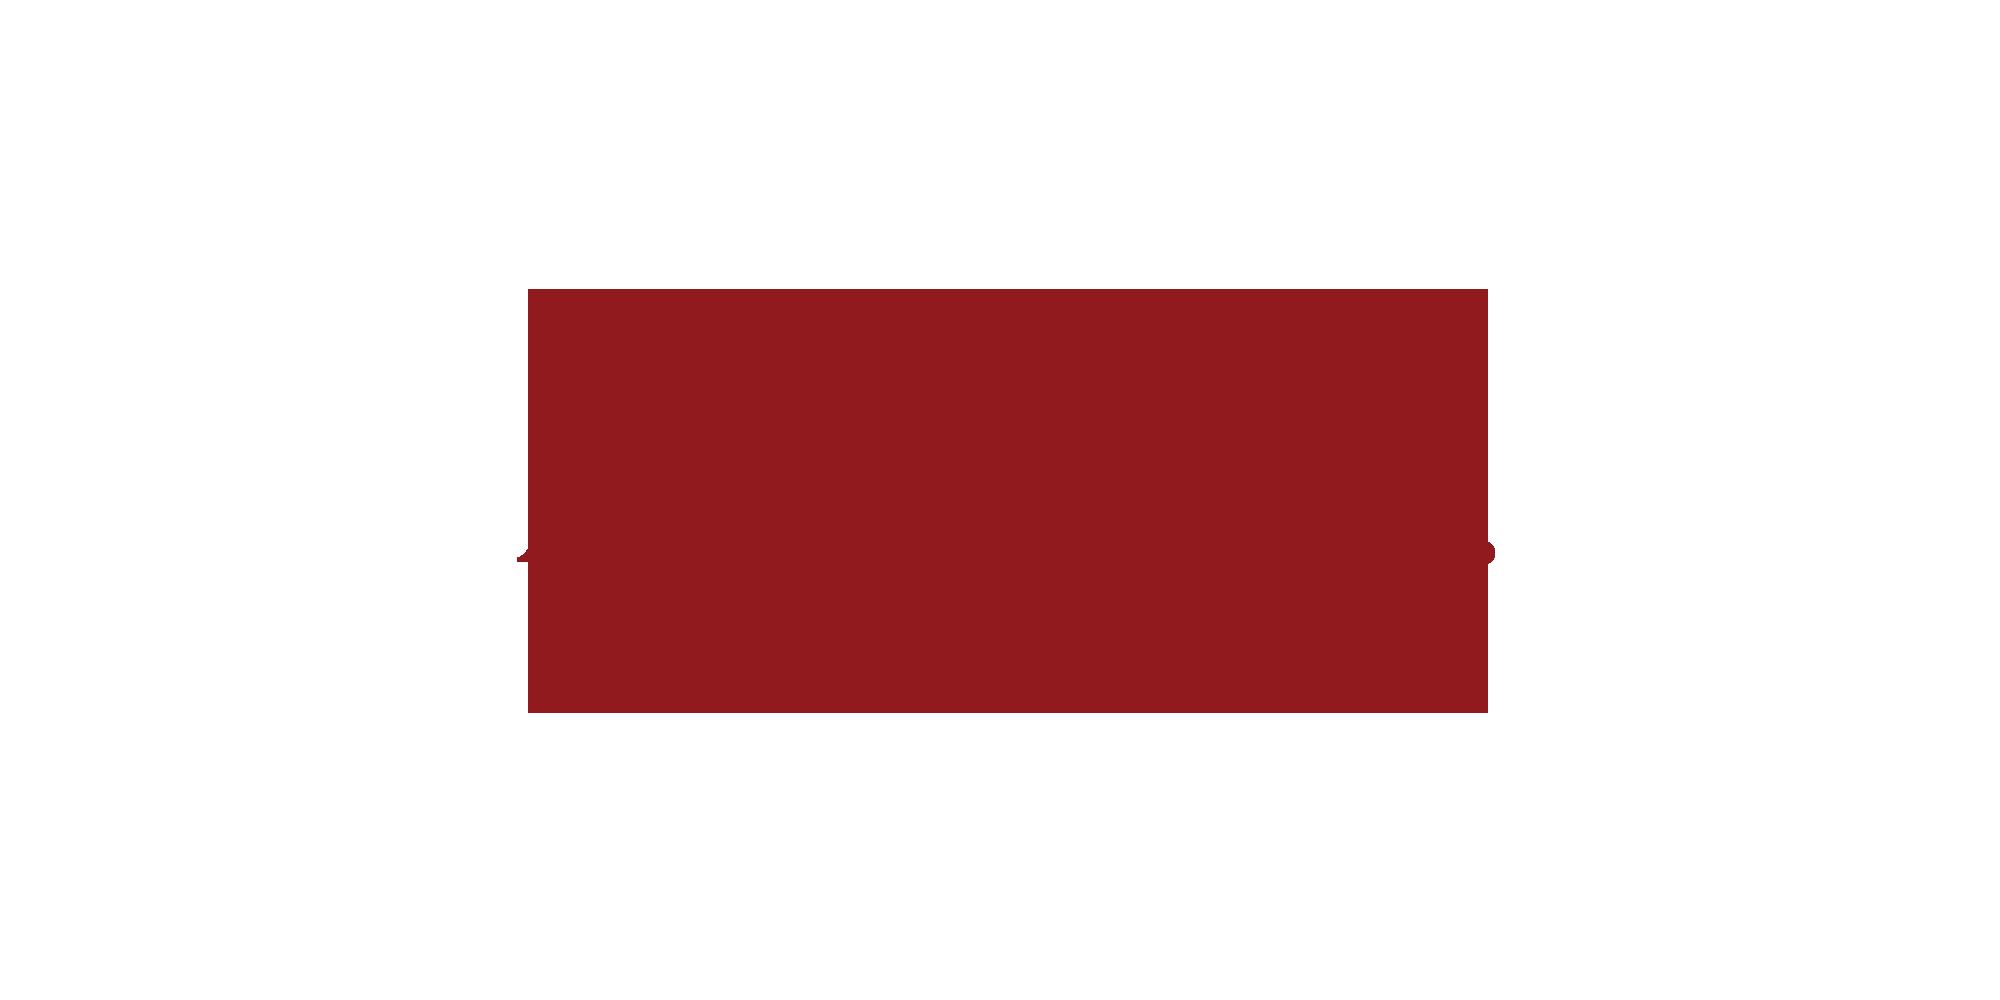 MC_reviewB_Greg.png